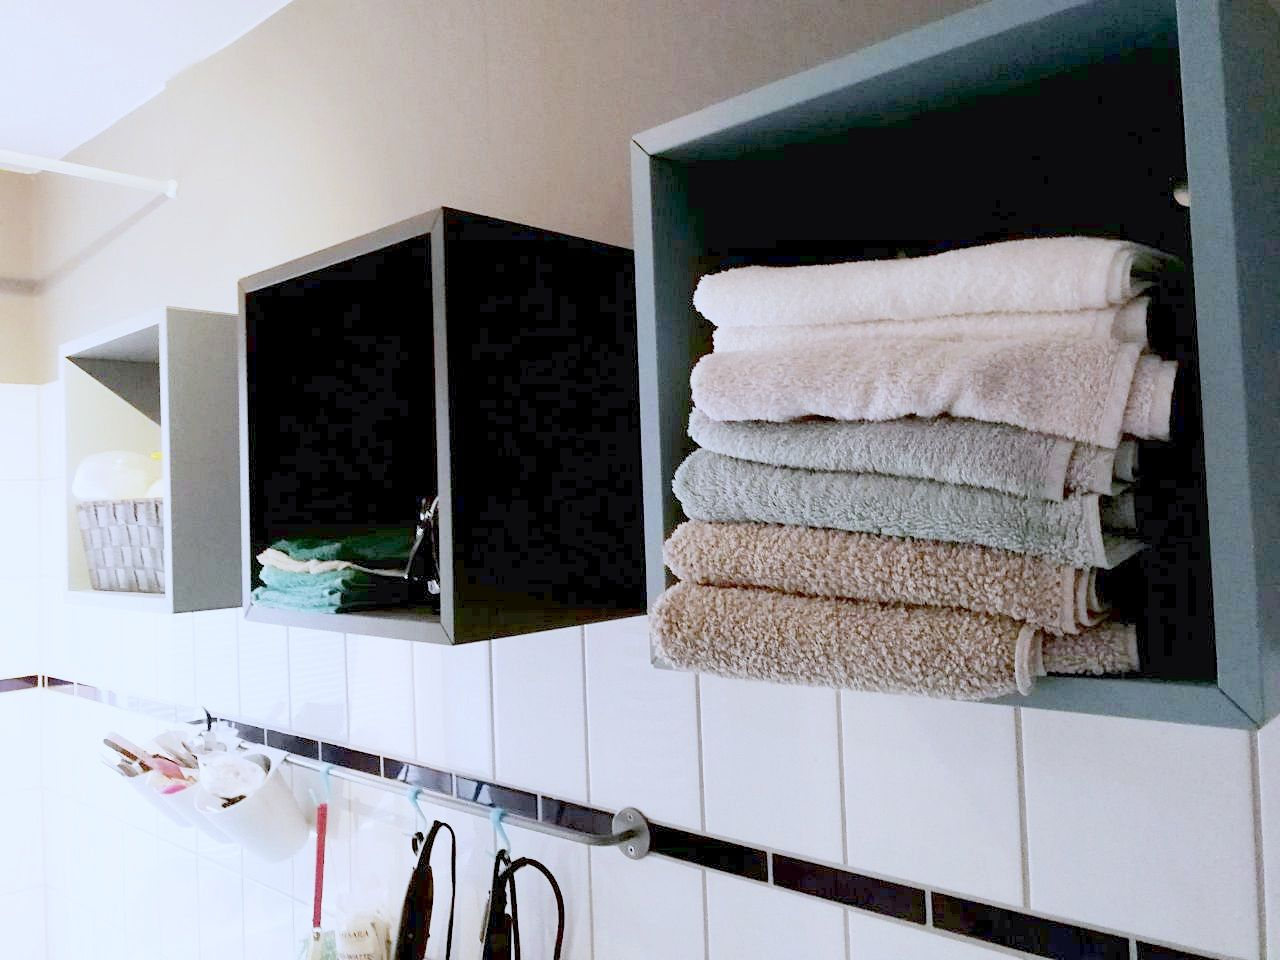 Badezimmer Handtücher ~ Die besten handtücher organisieren ideen auf